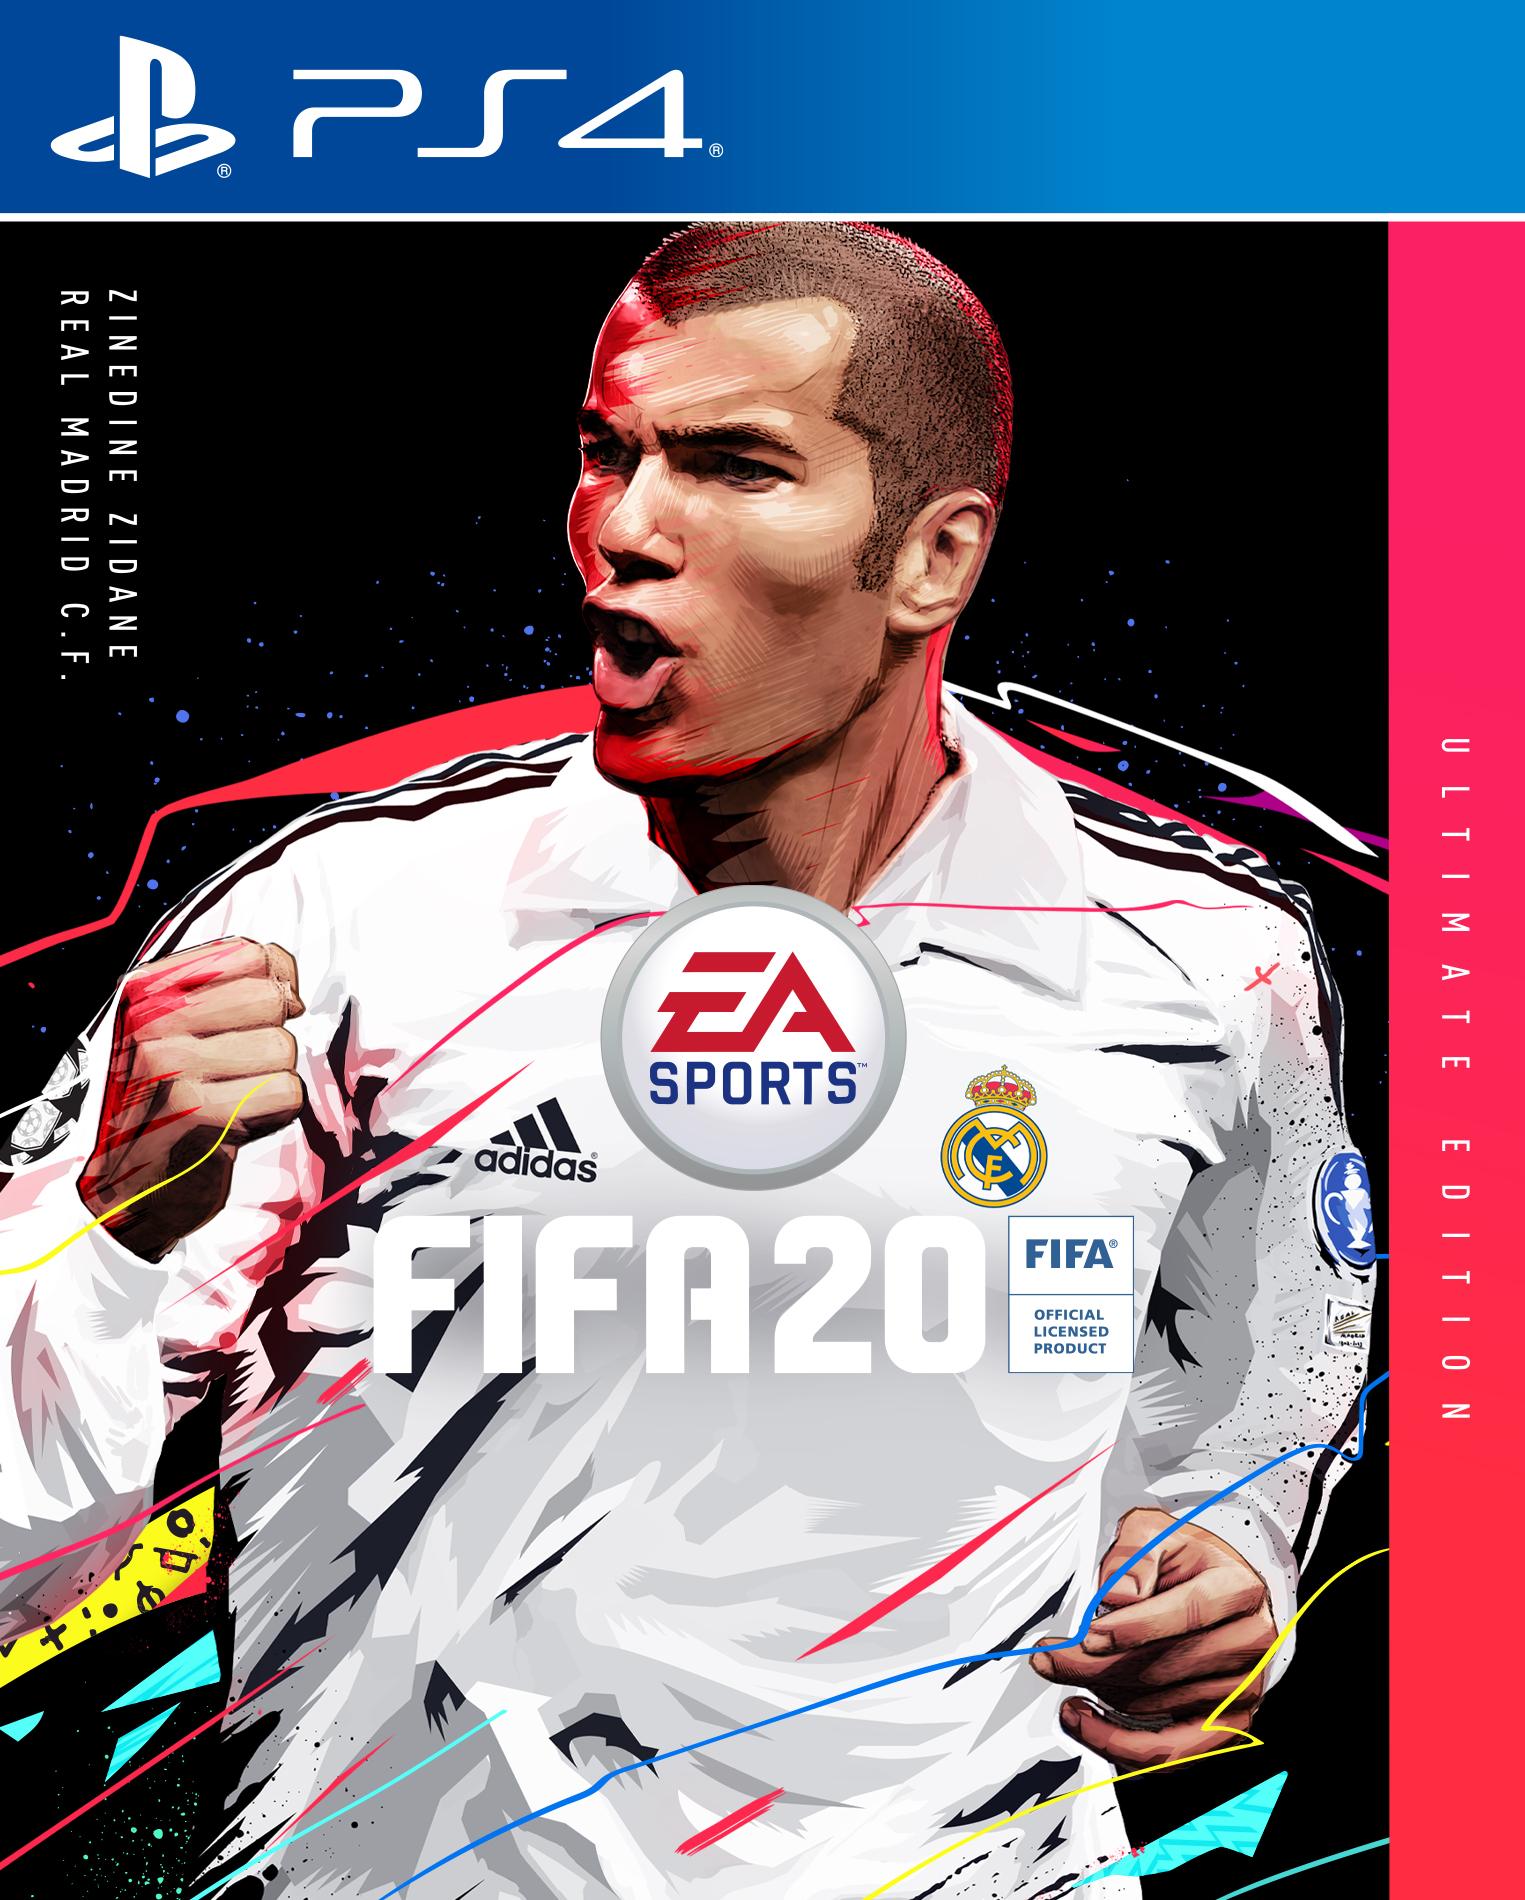 Officiel - Real Madrid : Zinedine Zidane sera sur la jaquette de FIFA 20